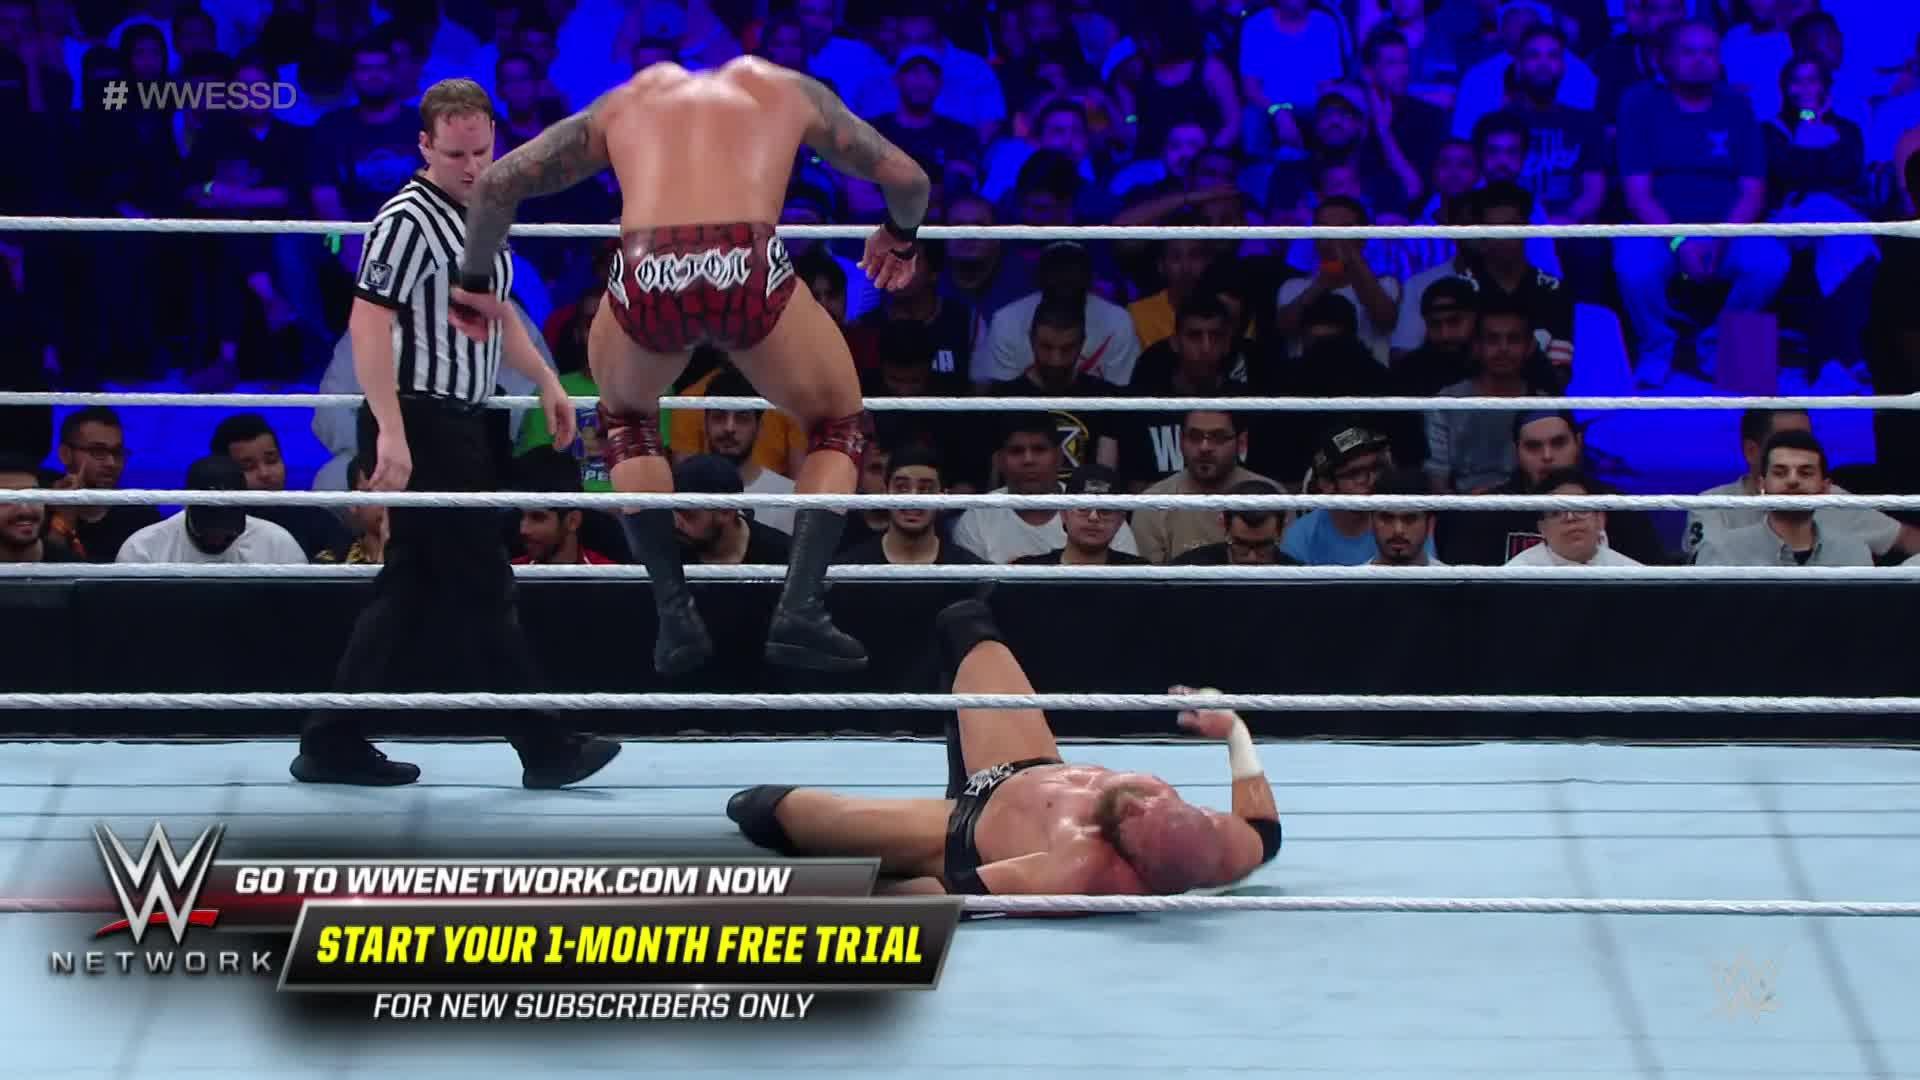 Randy Orton attaque Triple H sans merci: WWE Super ShowDown 2019